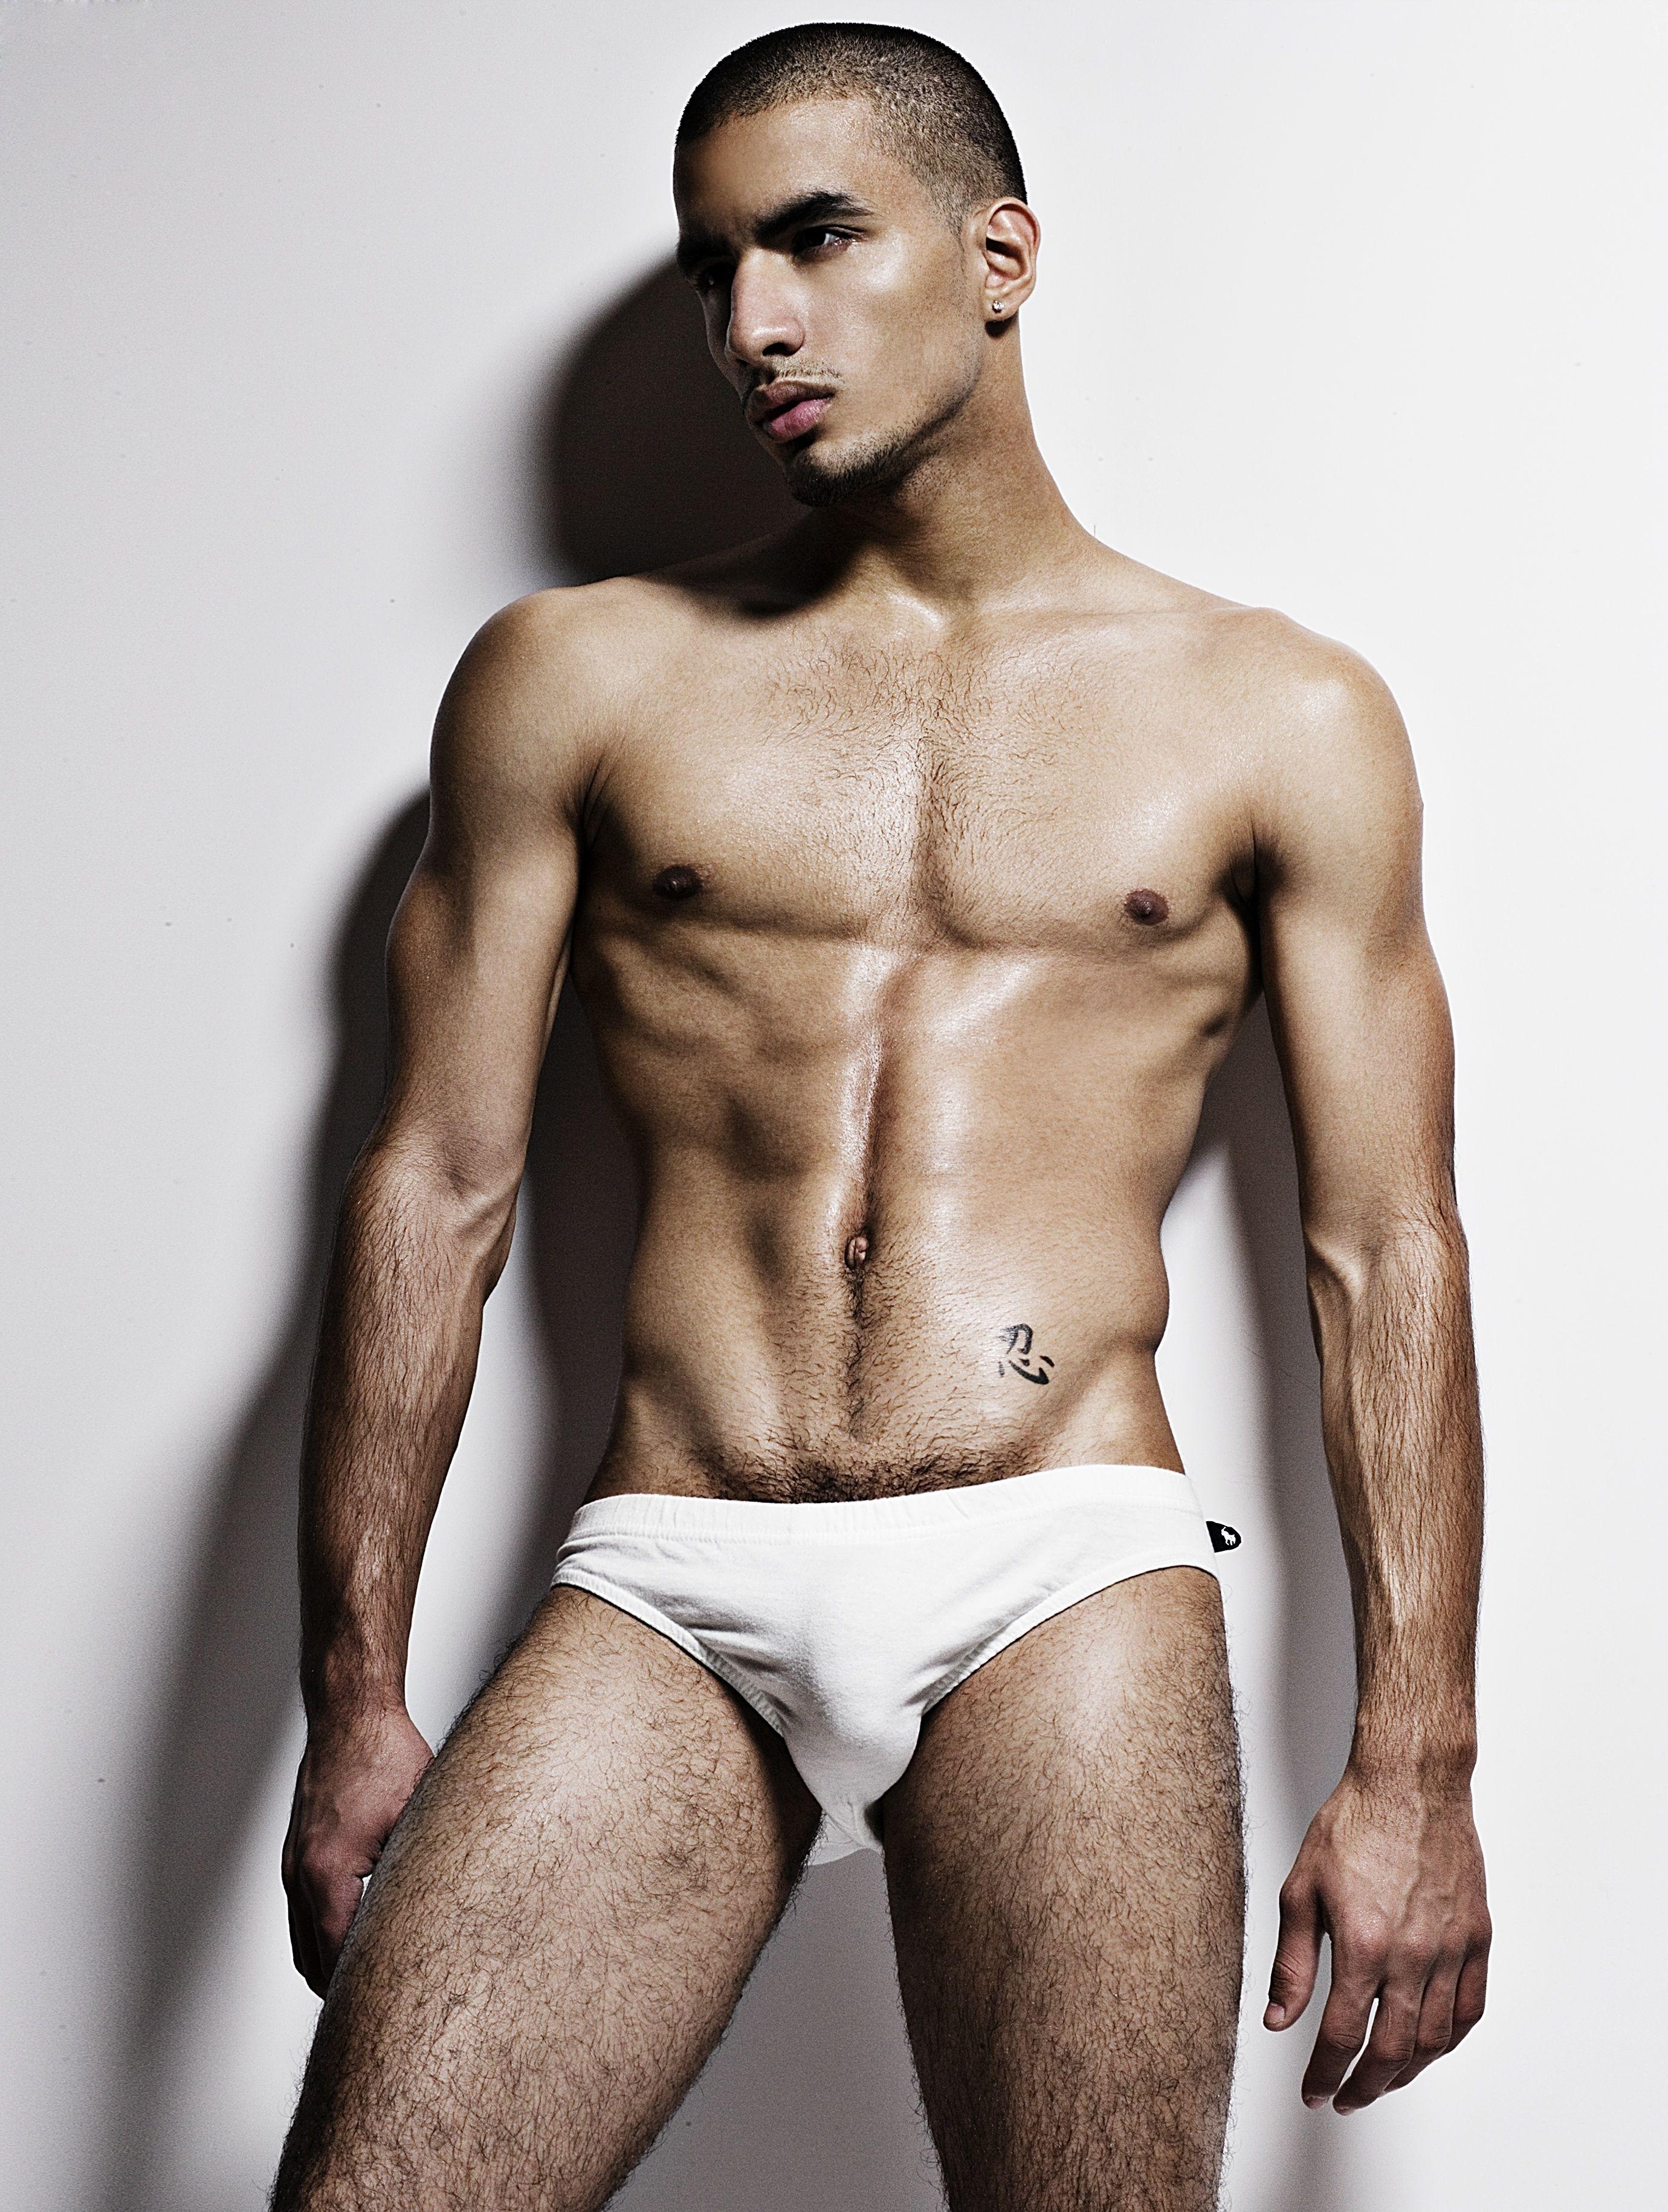 Hot Men Underwear Models